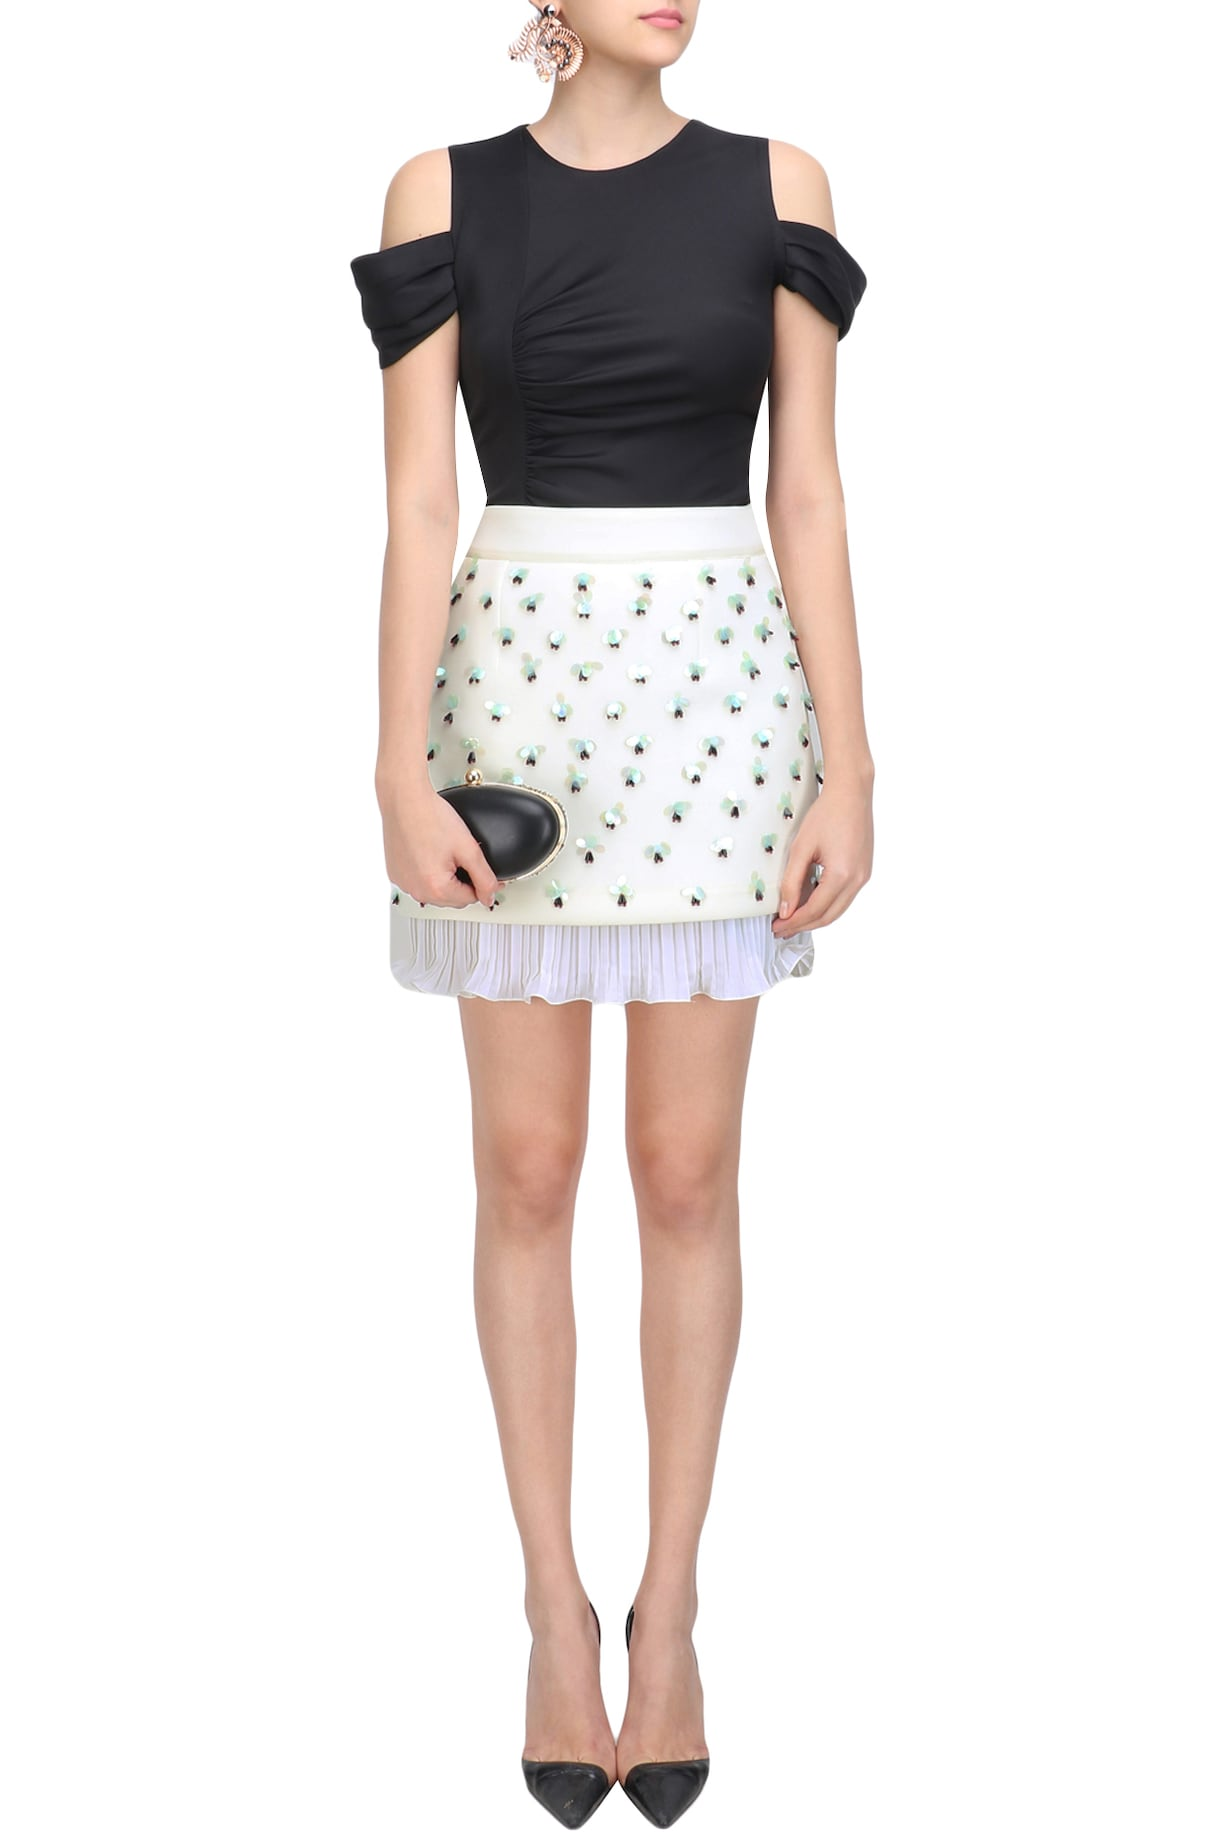 Sameer Madan Skirts